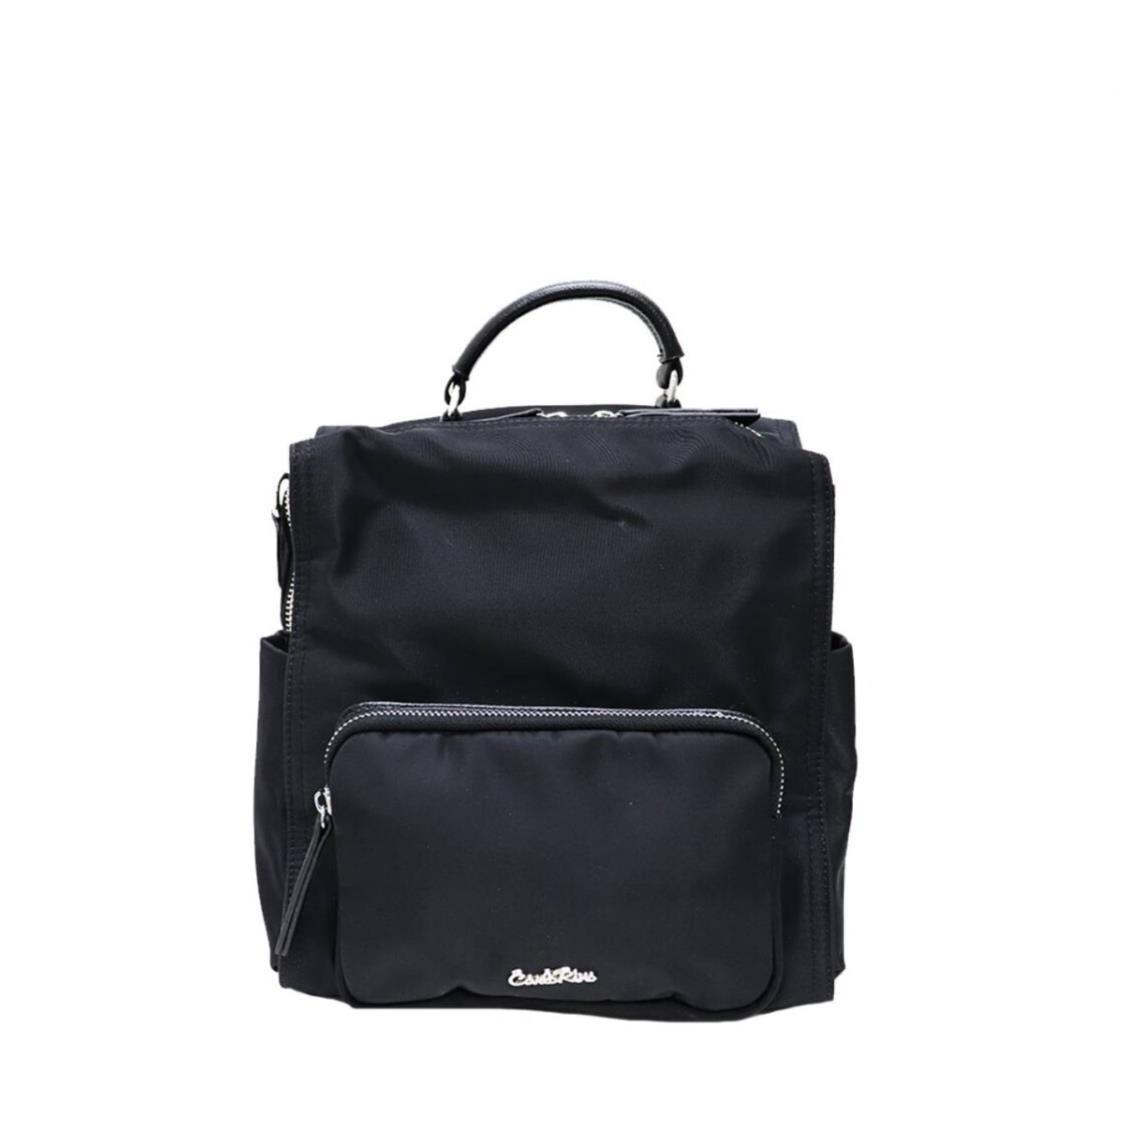 Carlo Rino Small Backpack 34953-006-08